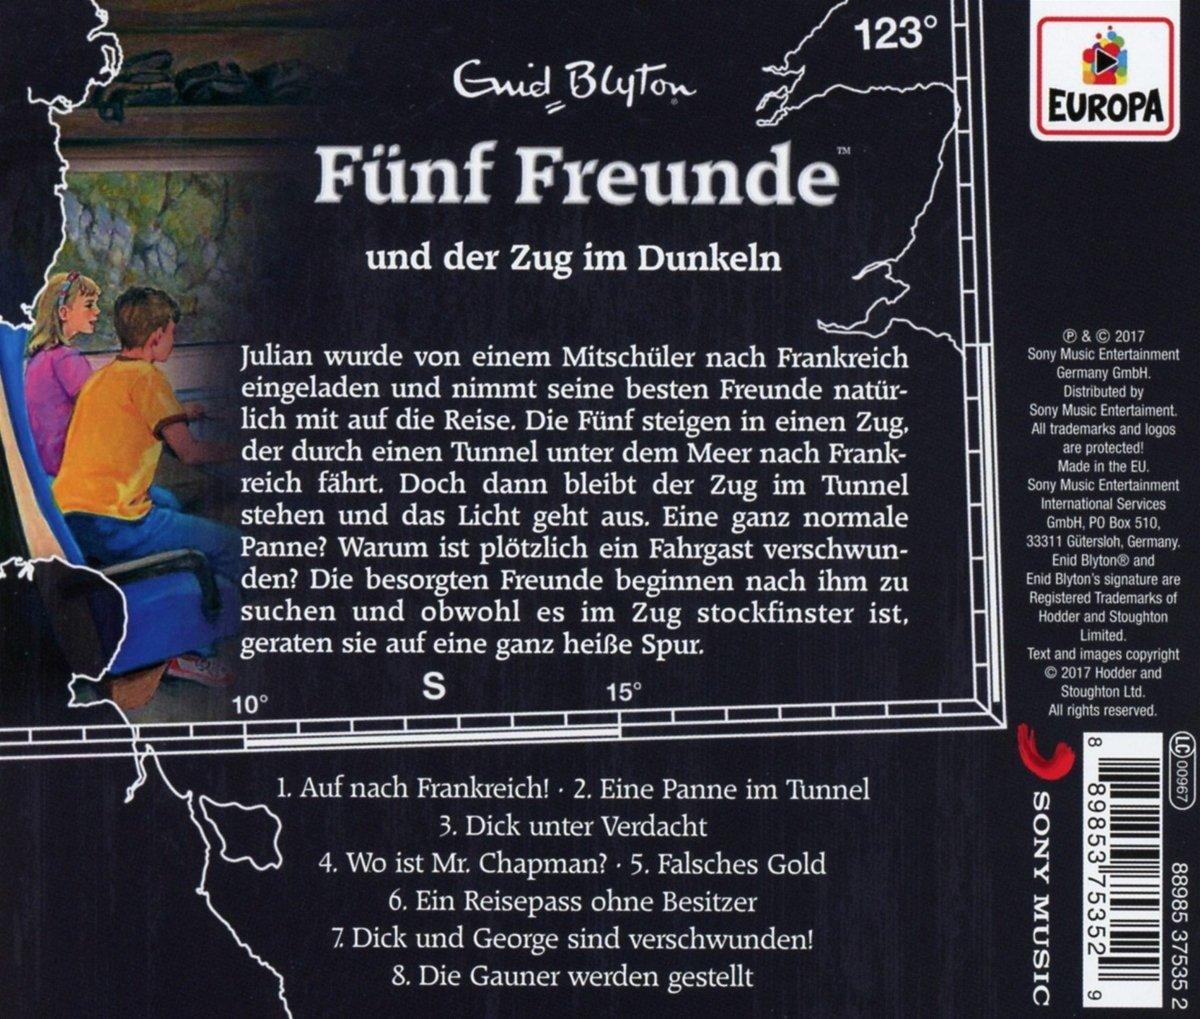 CD Fünf Freunde Folge 123 Zug im Dunkeln